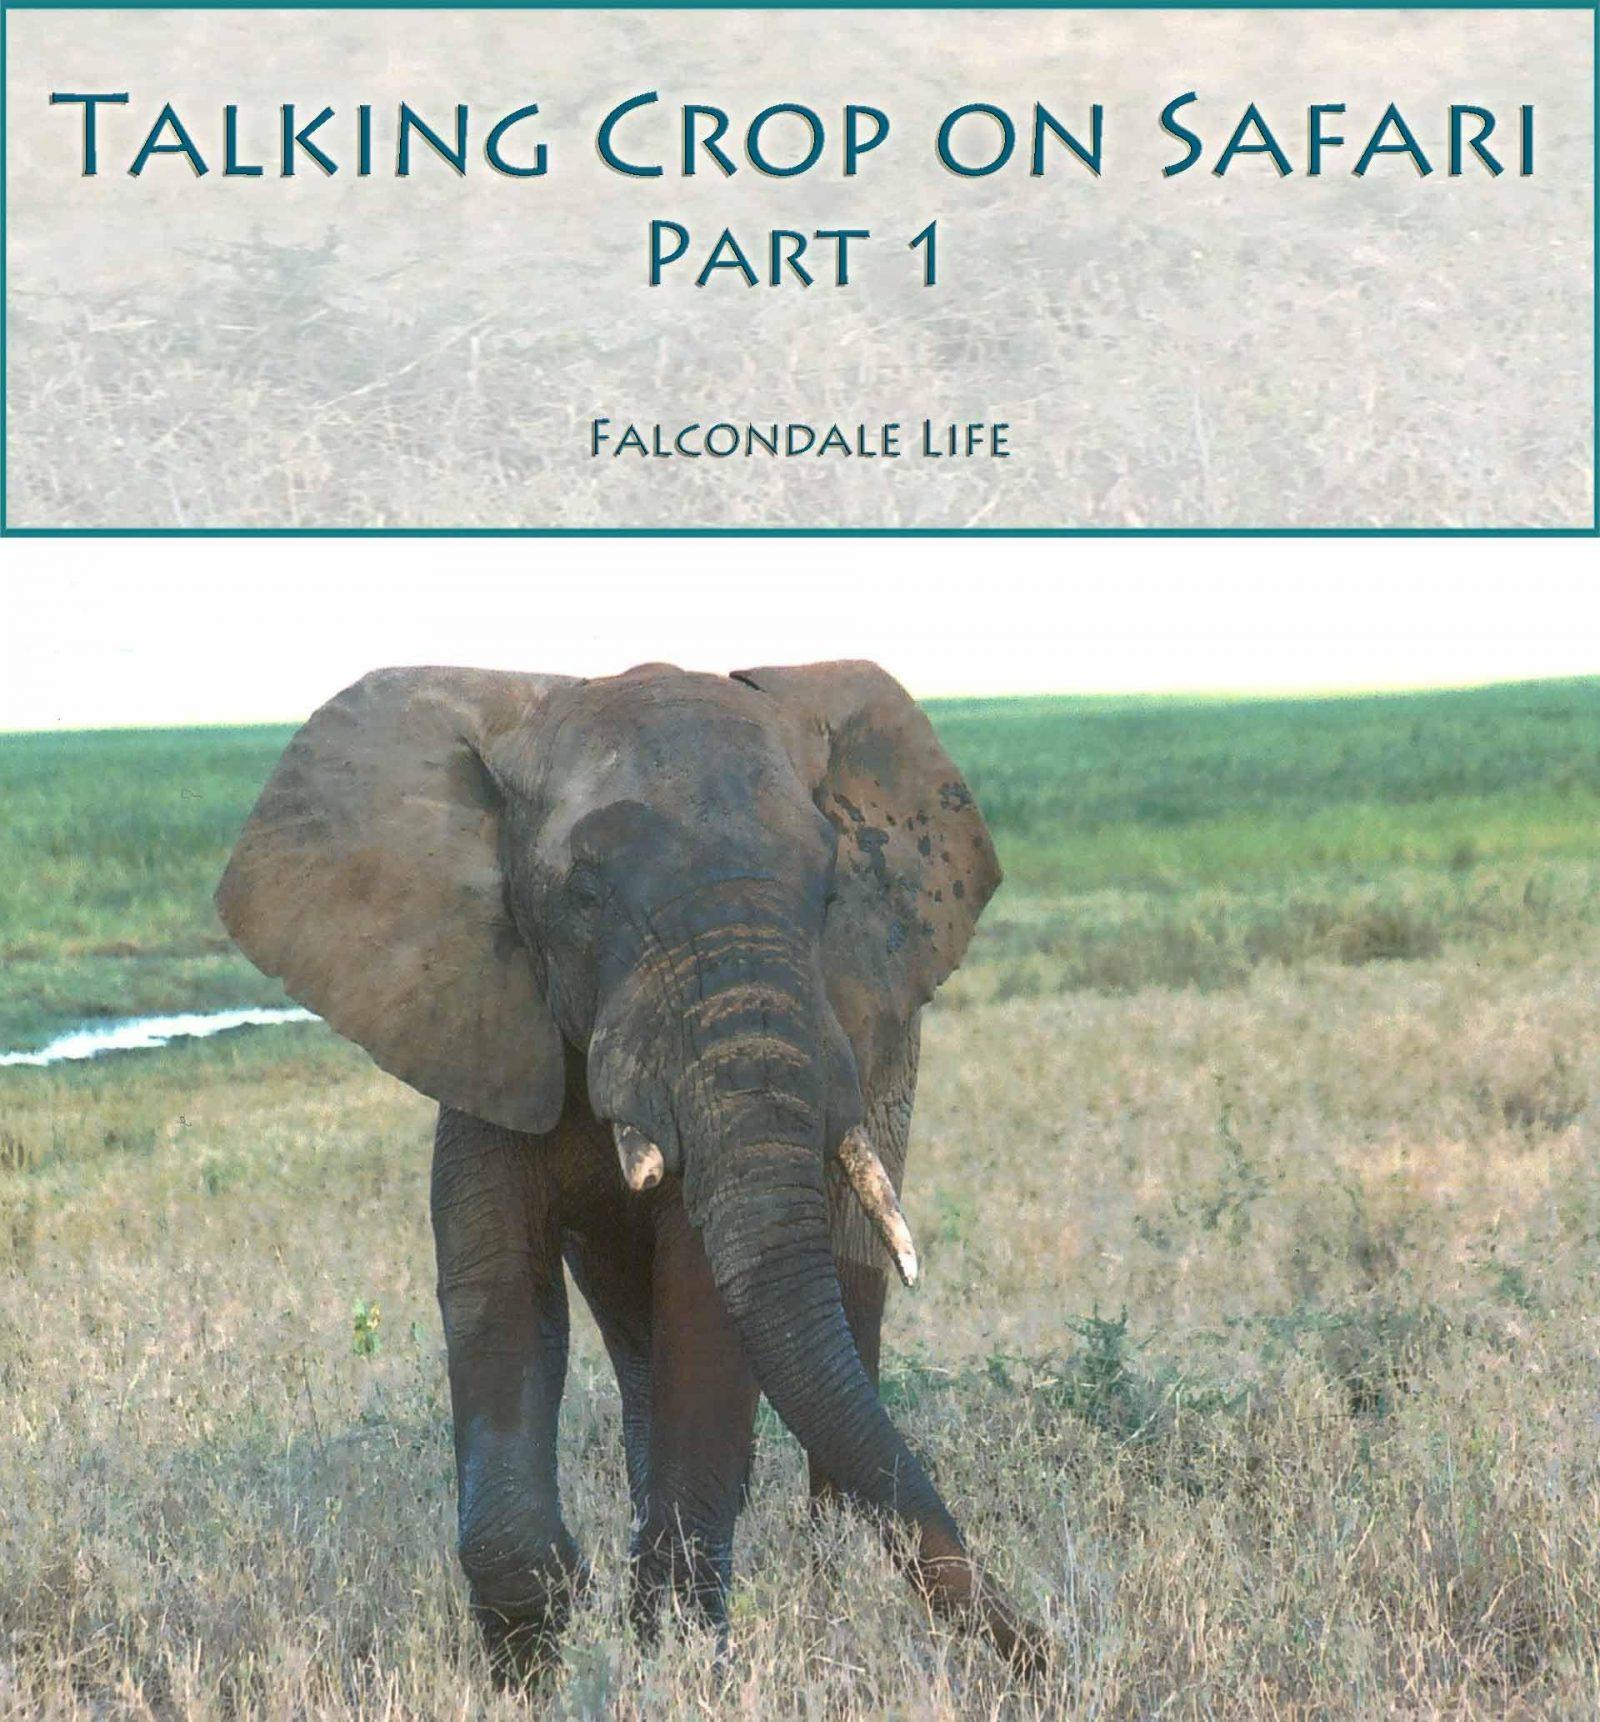 Talking Crop on Safari – Part 1